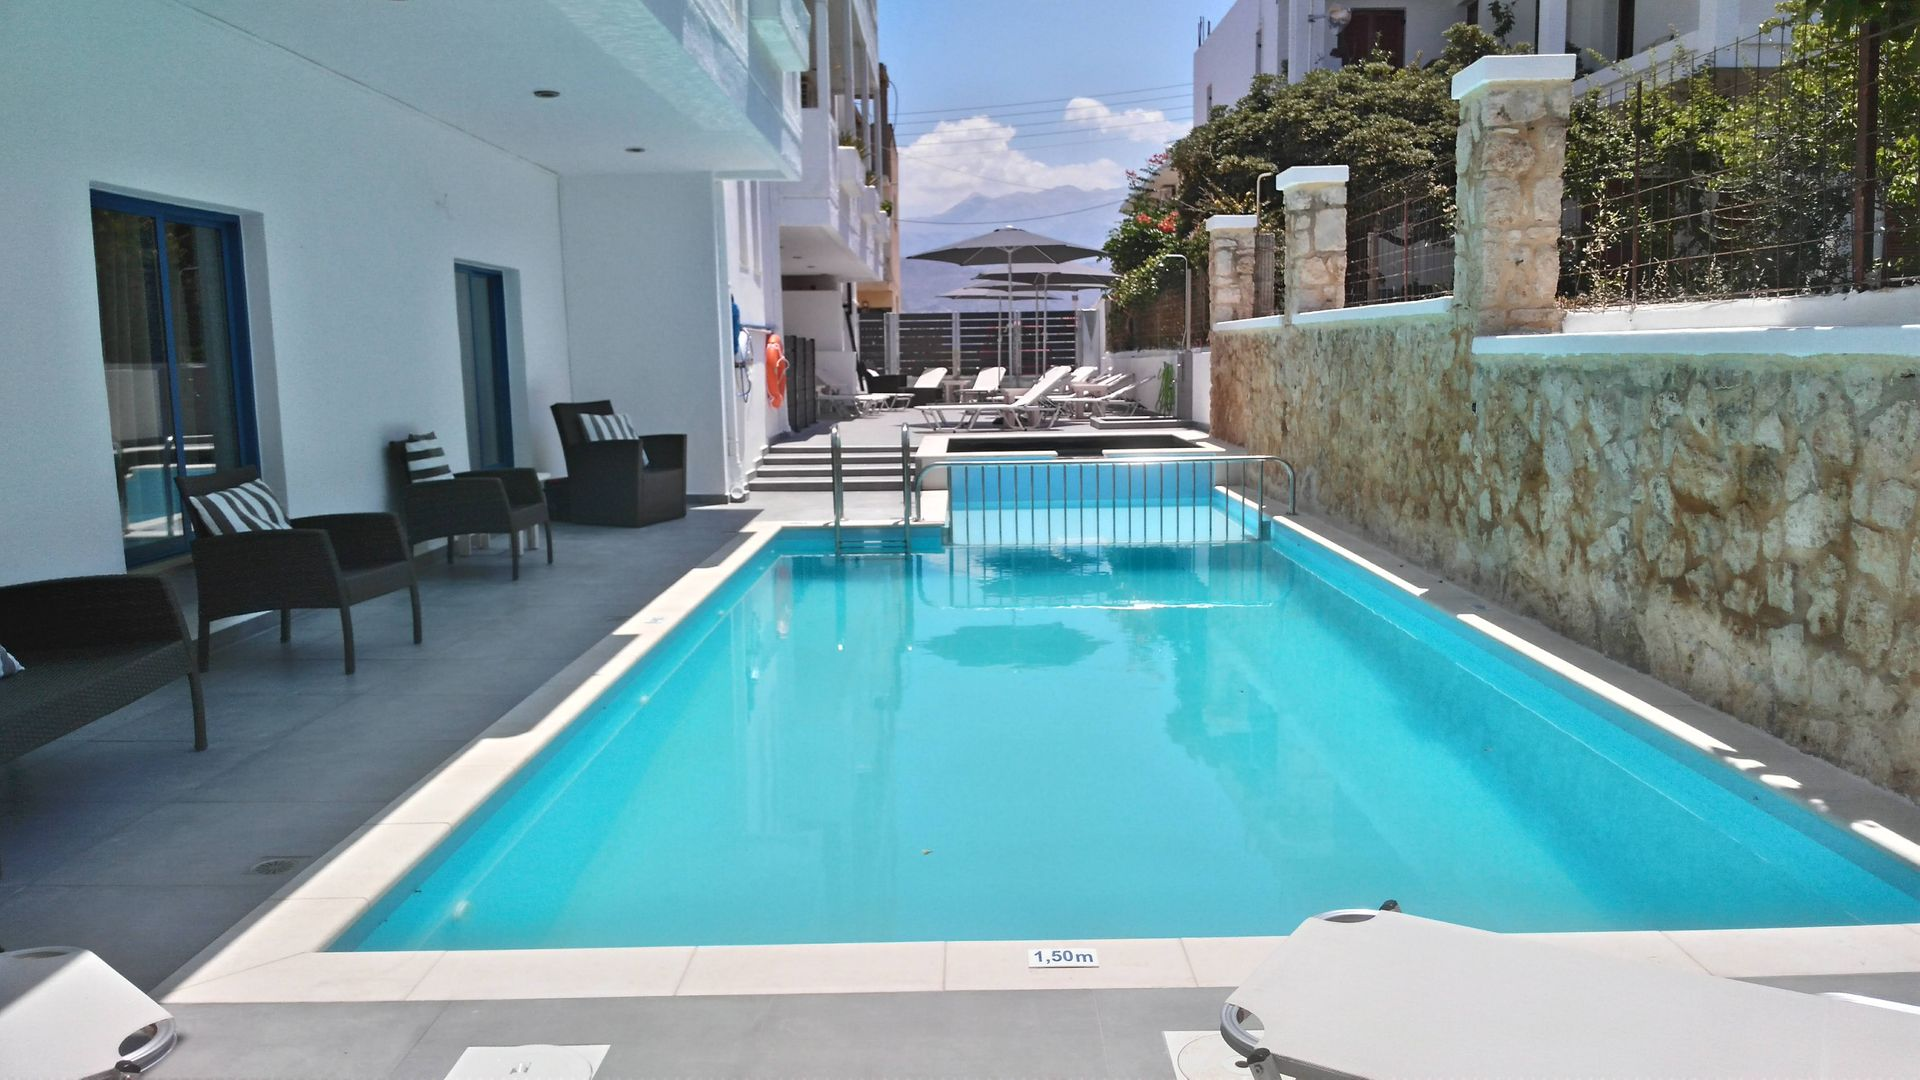 Alexis Hotel - Χανιά, Κρήτη ✦ 8 Ημέρες (7 Διανυκτερεύσεις) ✦ 2 άτομα + 1 παιδί έως 6 ετών ✦ Χωρίς Πρωινό ✦ 01/09/2021 έως 30/09/2021 ✦ Κοντά σε παραλία!